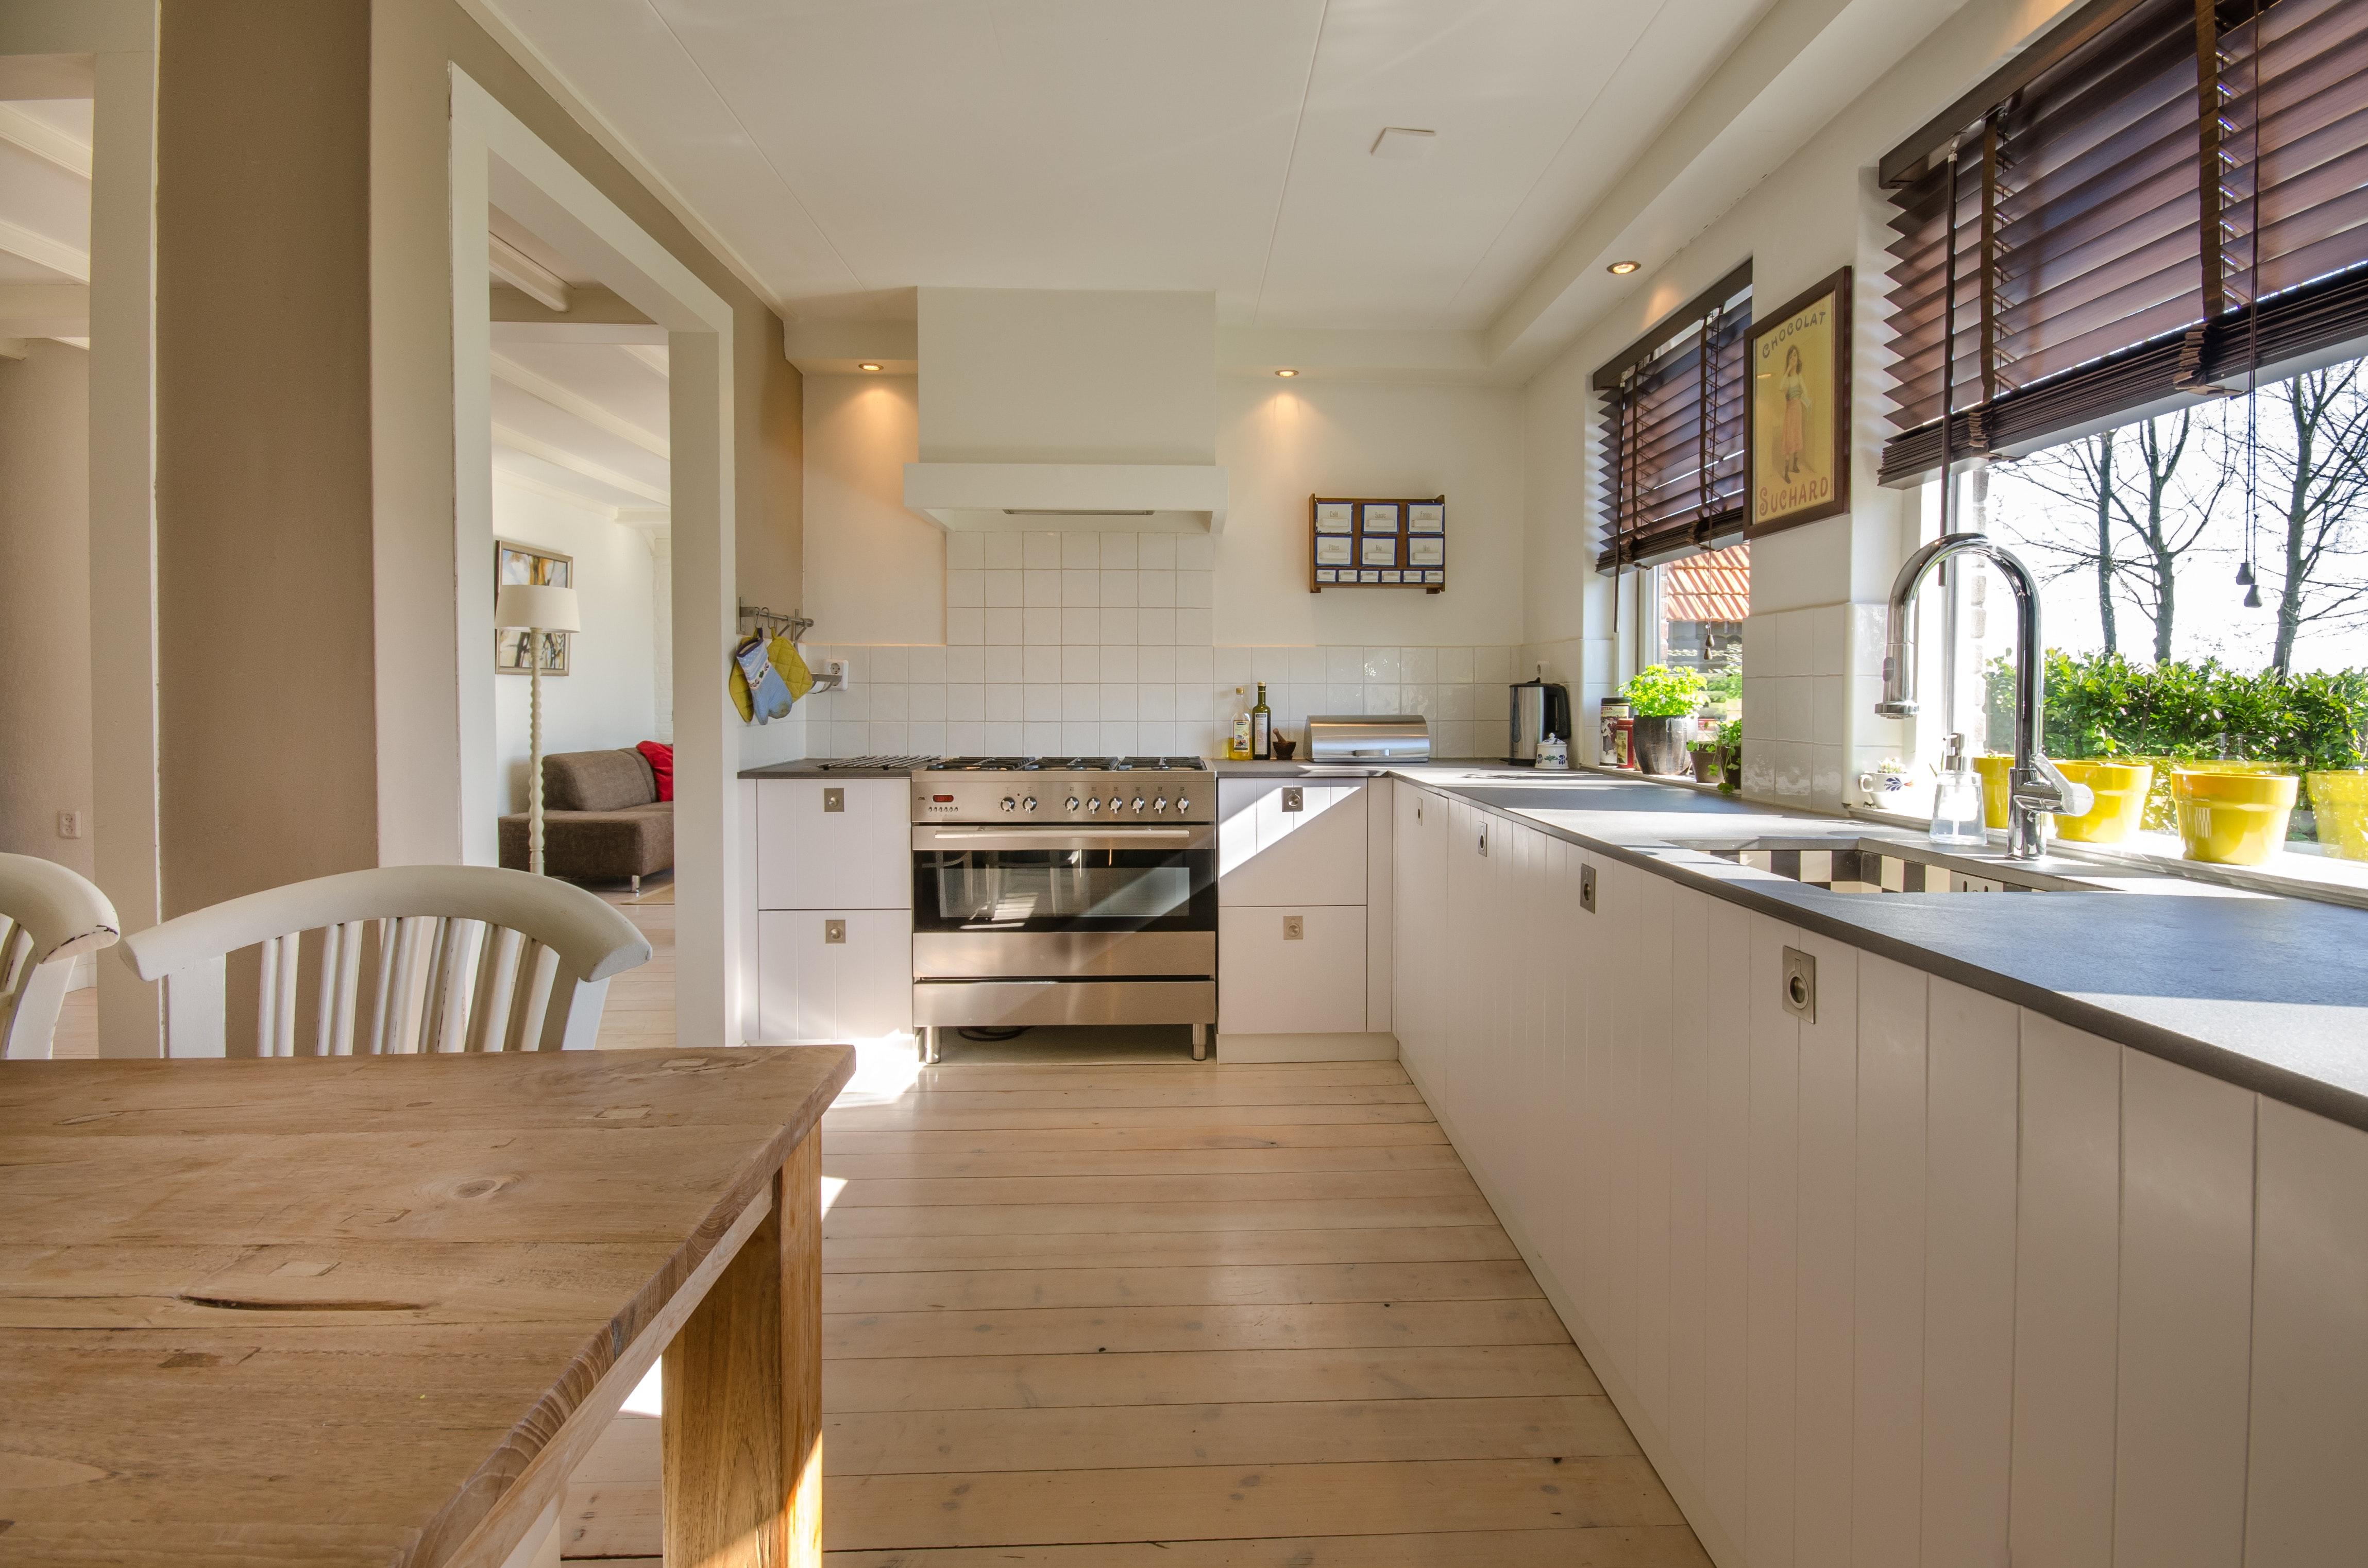 Exceptionnel 500+ Kitchen Photos · Pexels · Free Stock Photos